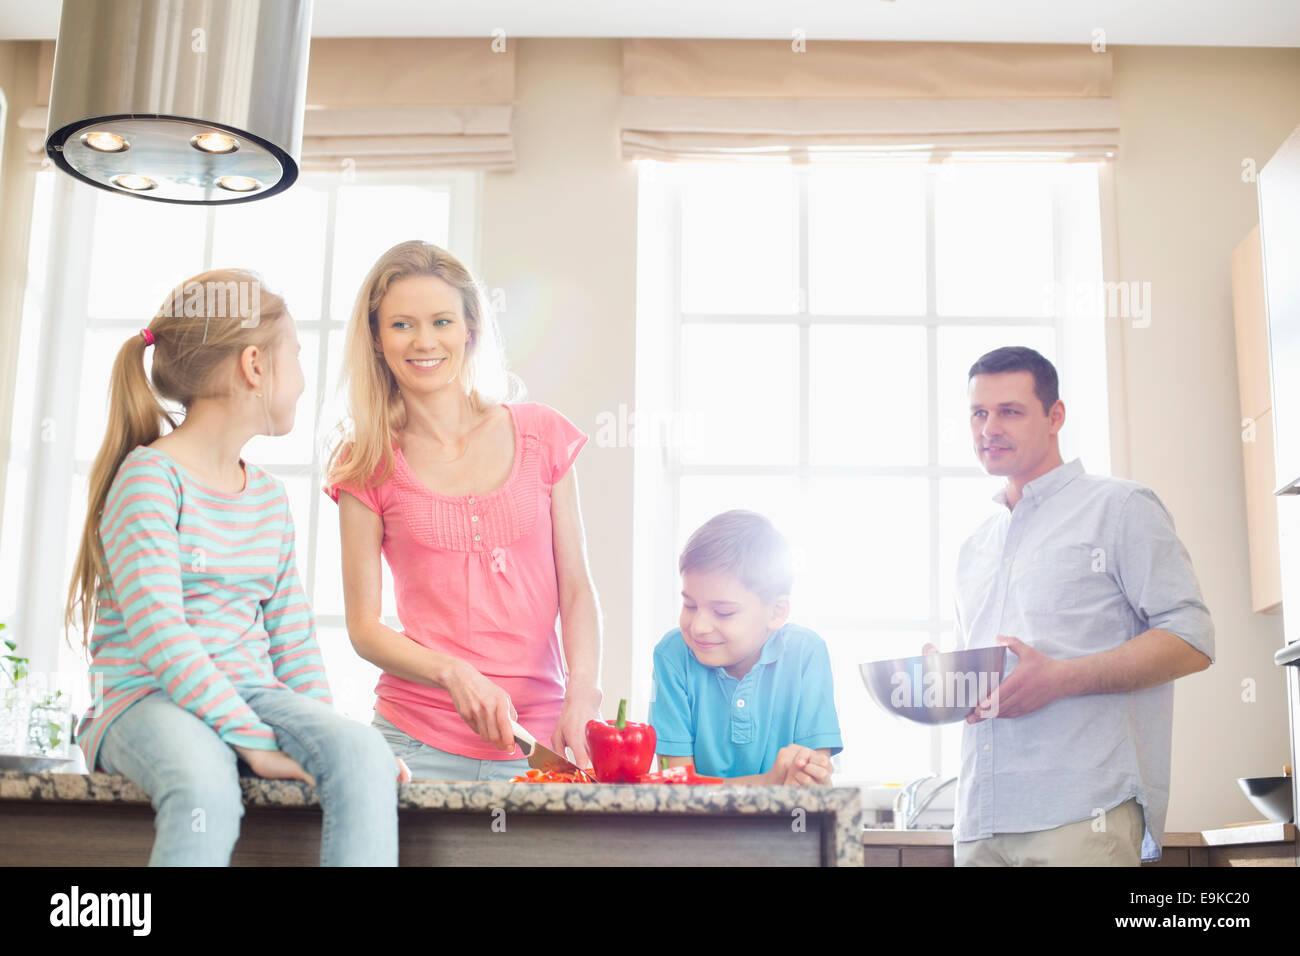 Familia preparando la comida en la cocina Imagen De Stock